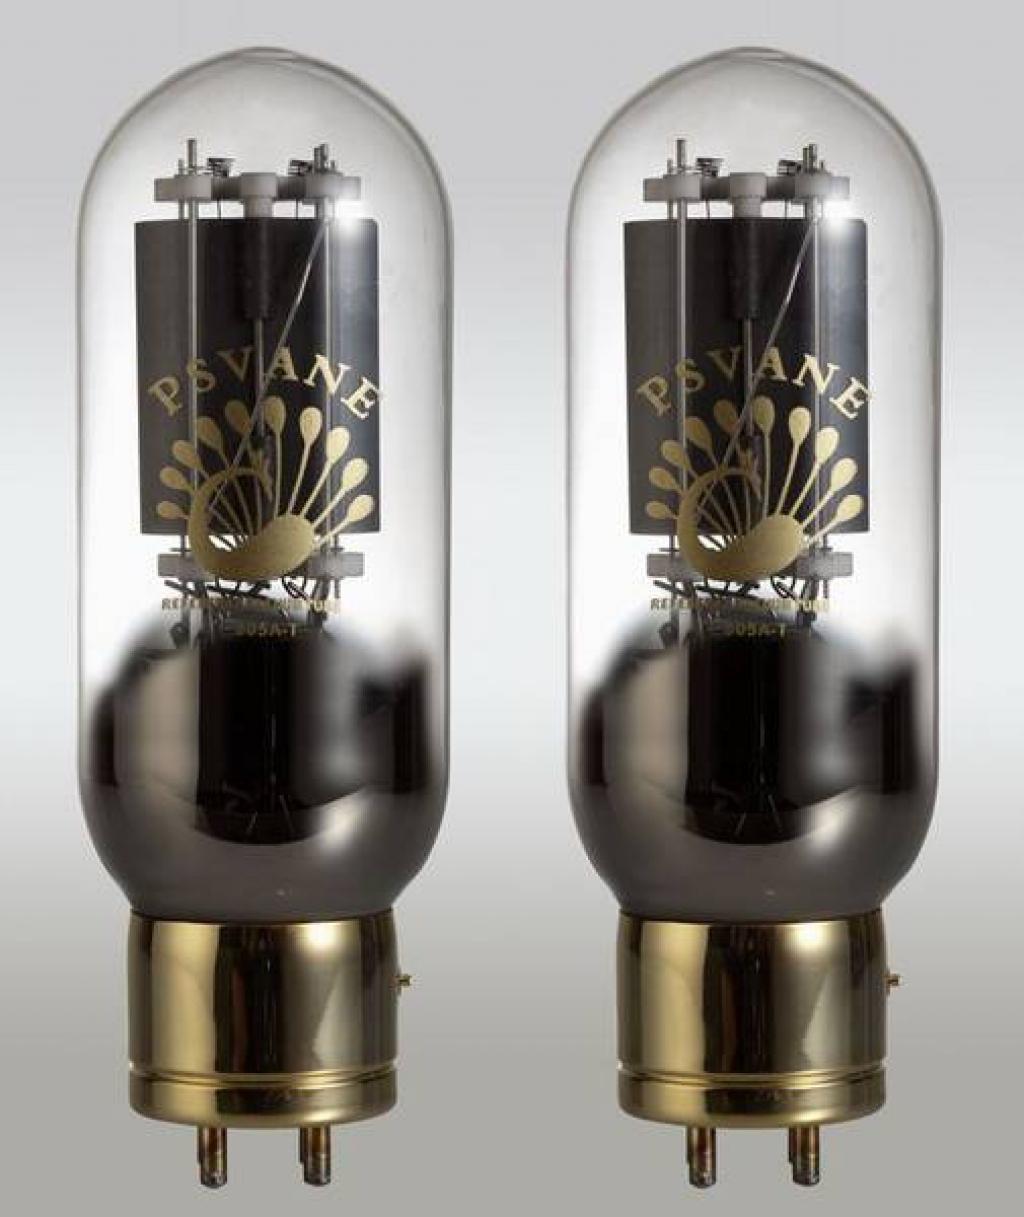 Lampa NOS ( Tub ) Psvane 805A-T/2